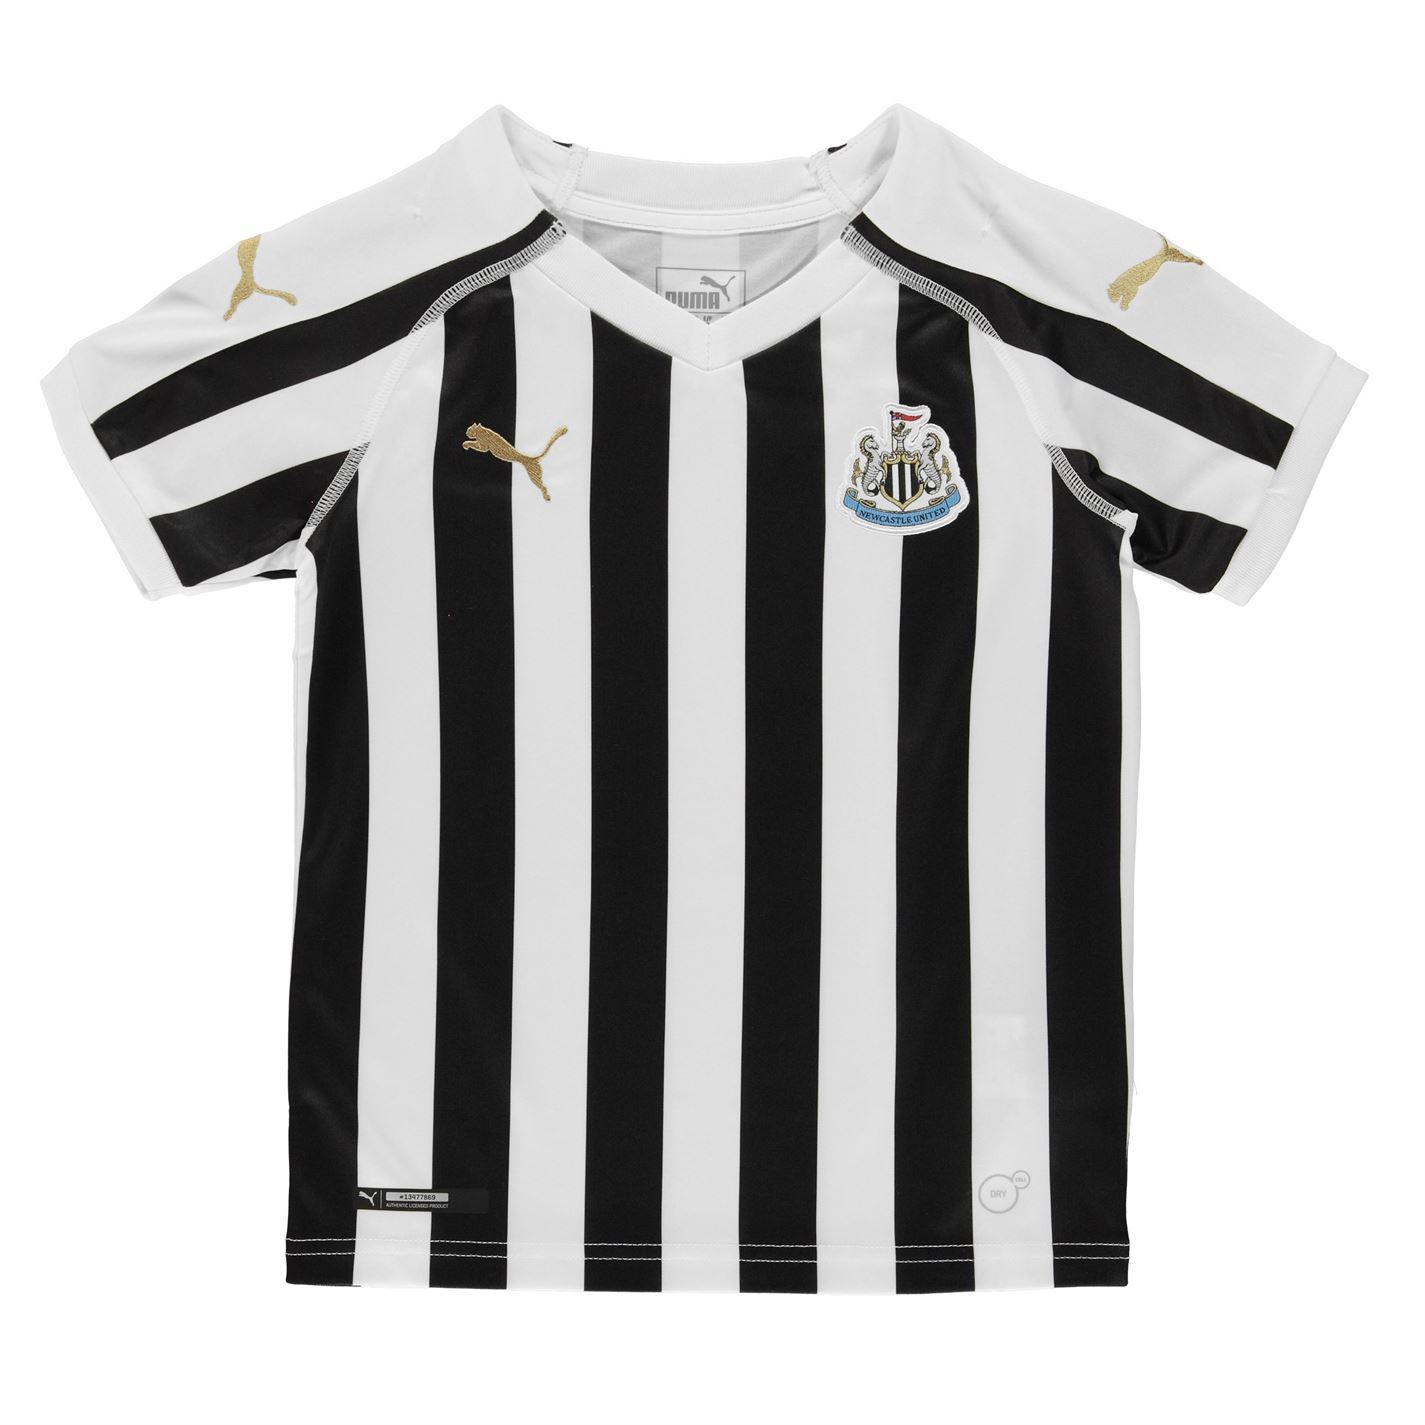 ... Puma Newcastle United Home Jersey 2018 2019 Juniors Blk Wht Football  Soccer Top ... 165c216b3